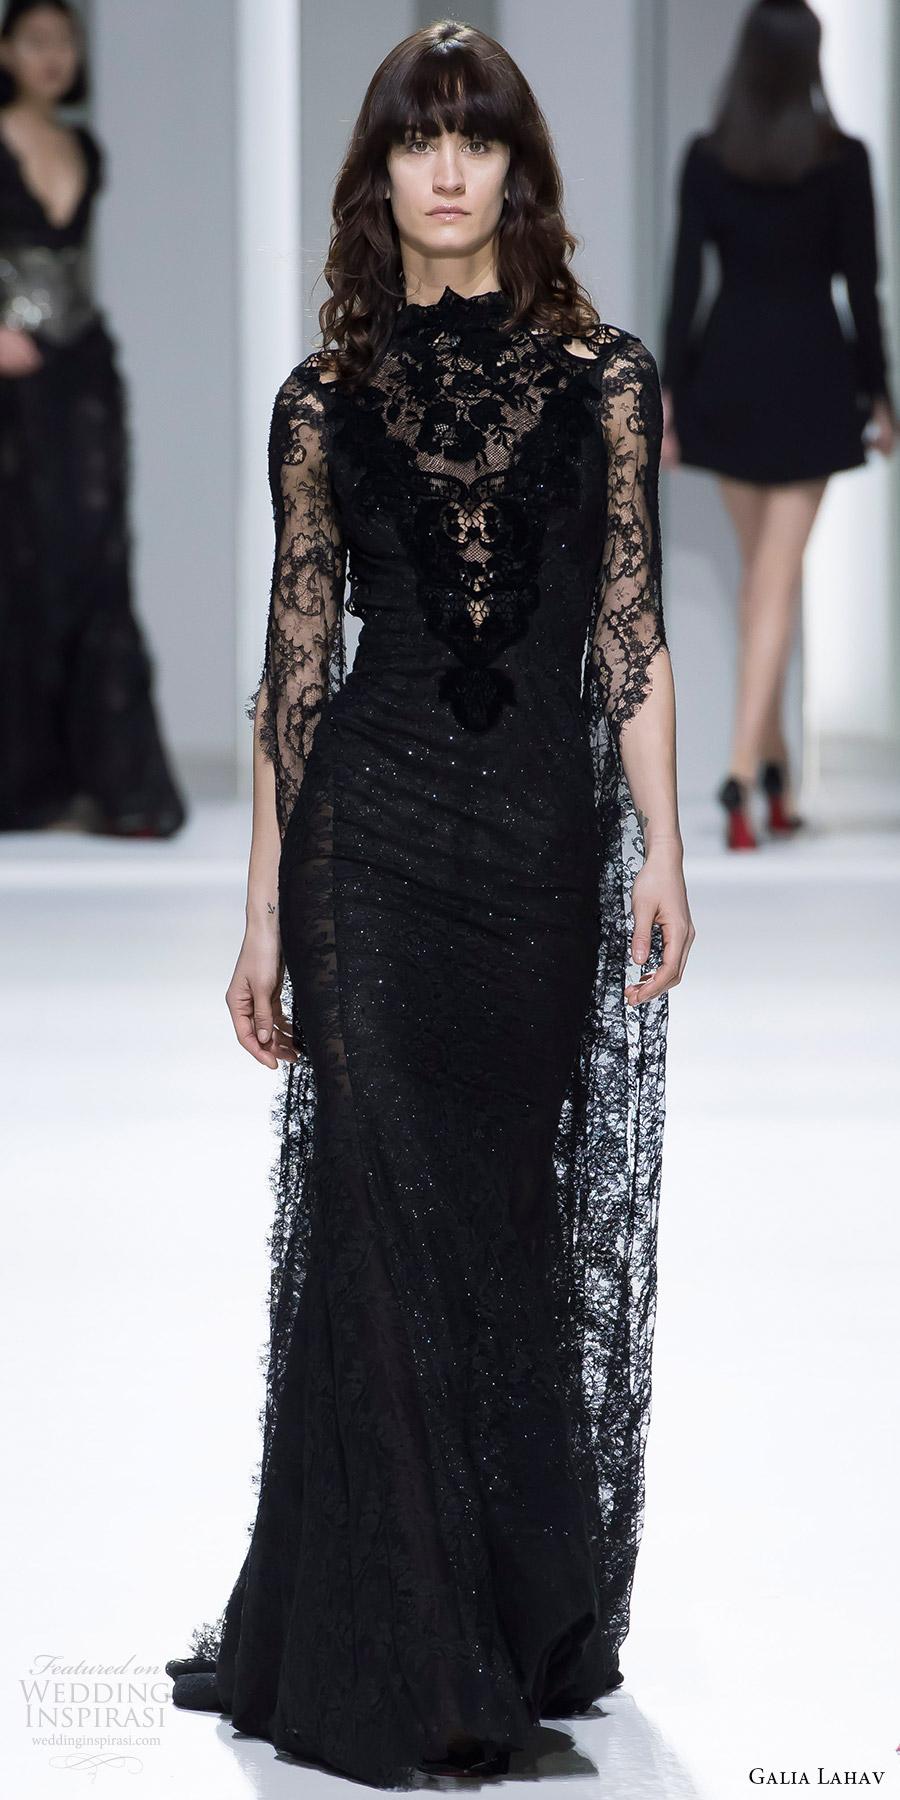 galia lahav haute couture spring 2017 (marion) gown